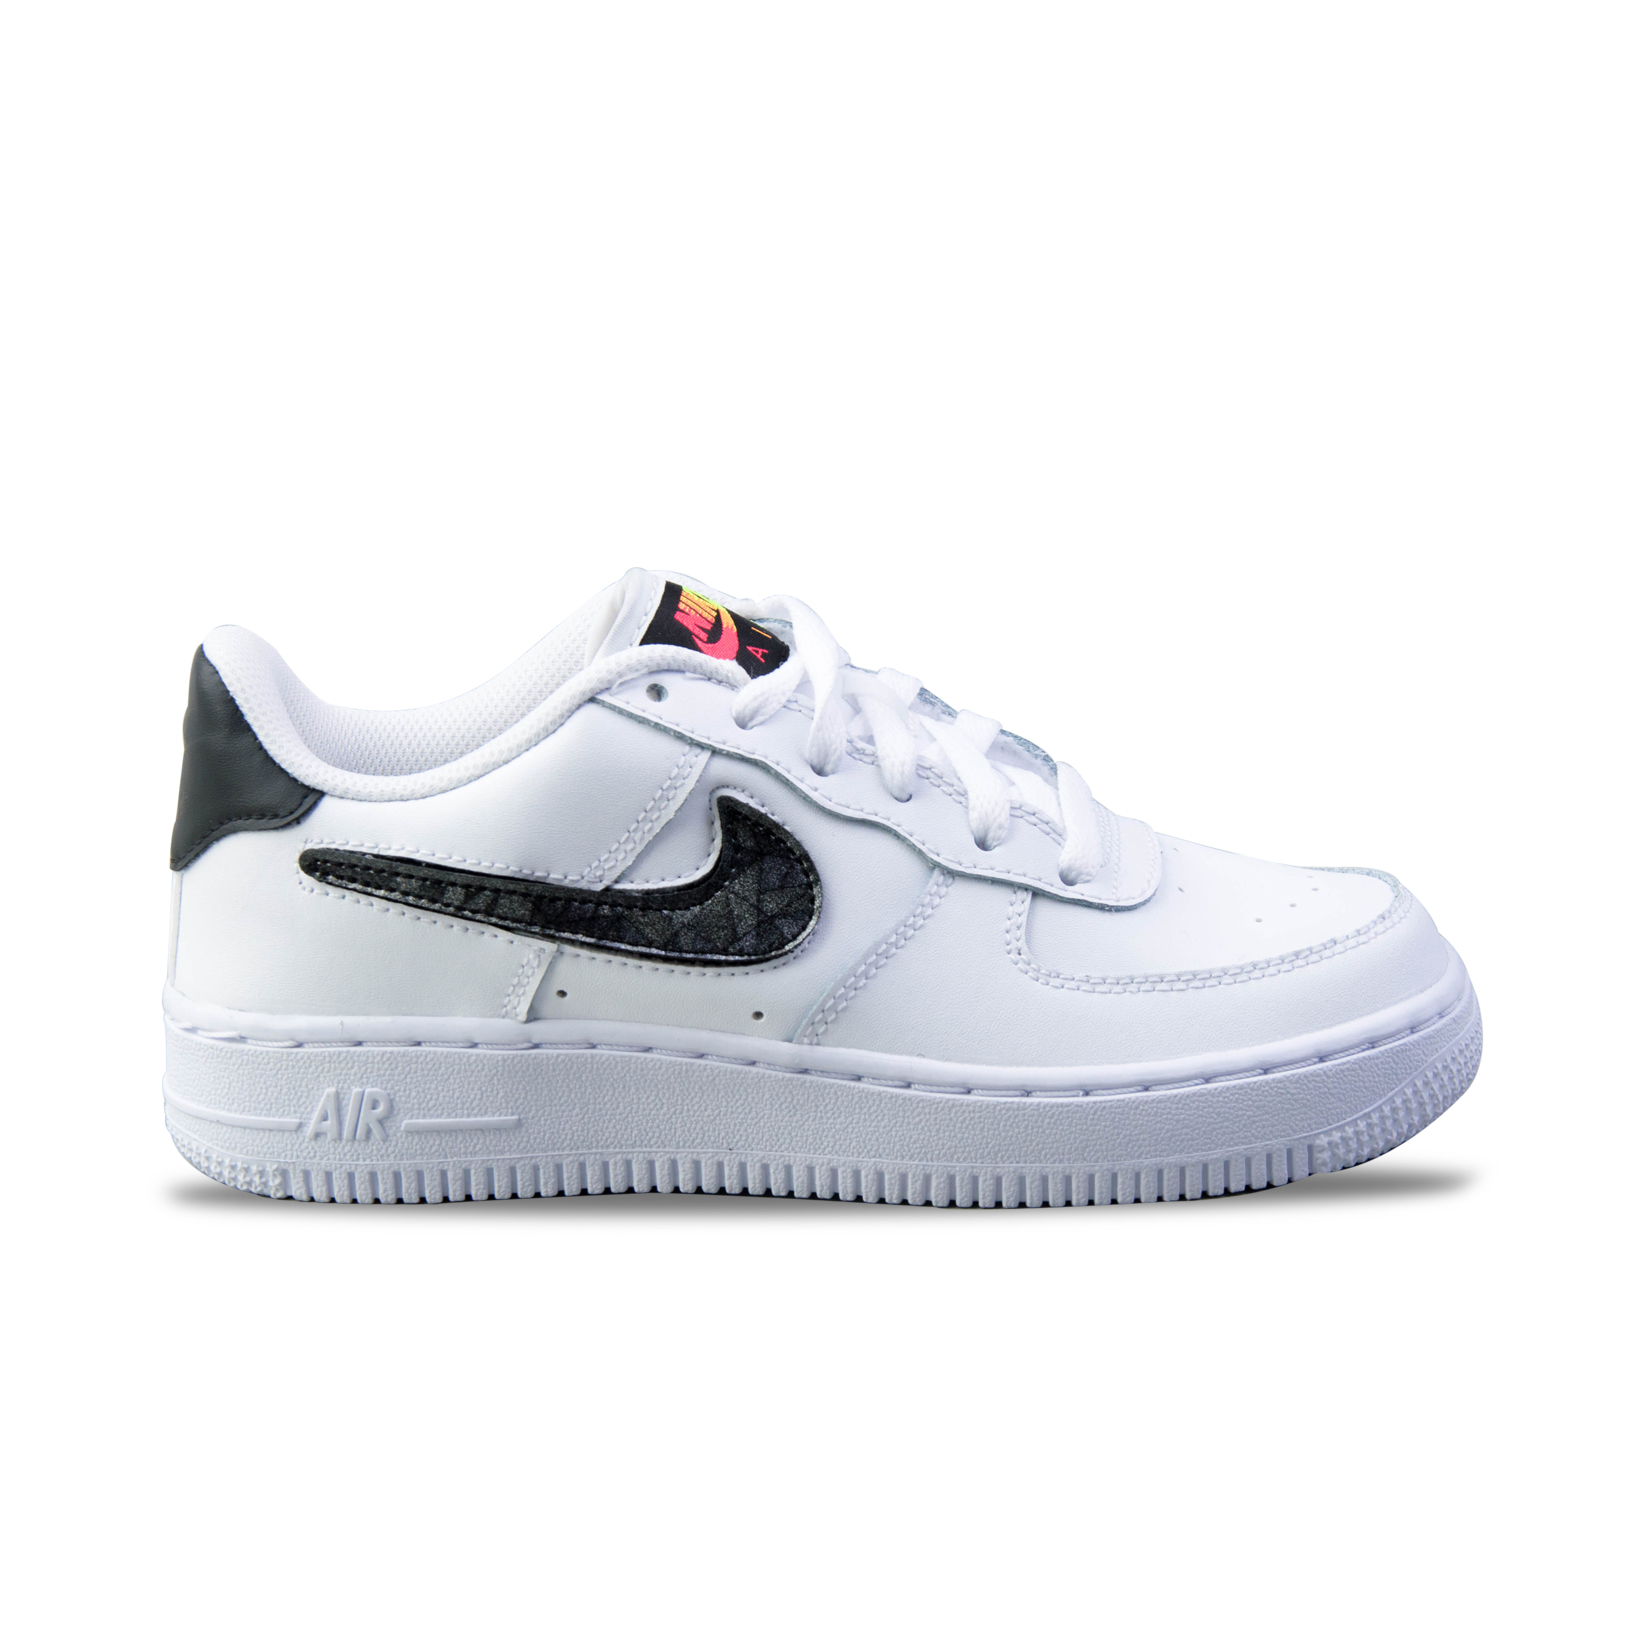 Nike Air Force 1 07 LV8 3 GS White - Grey